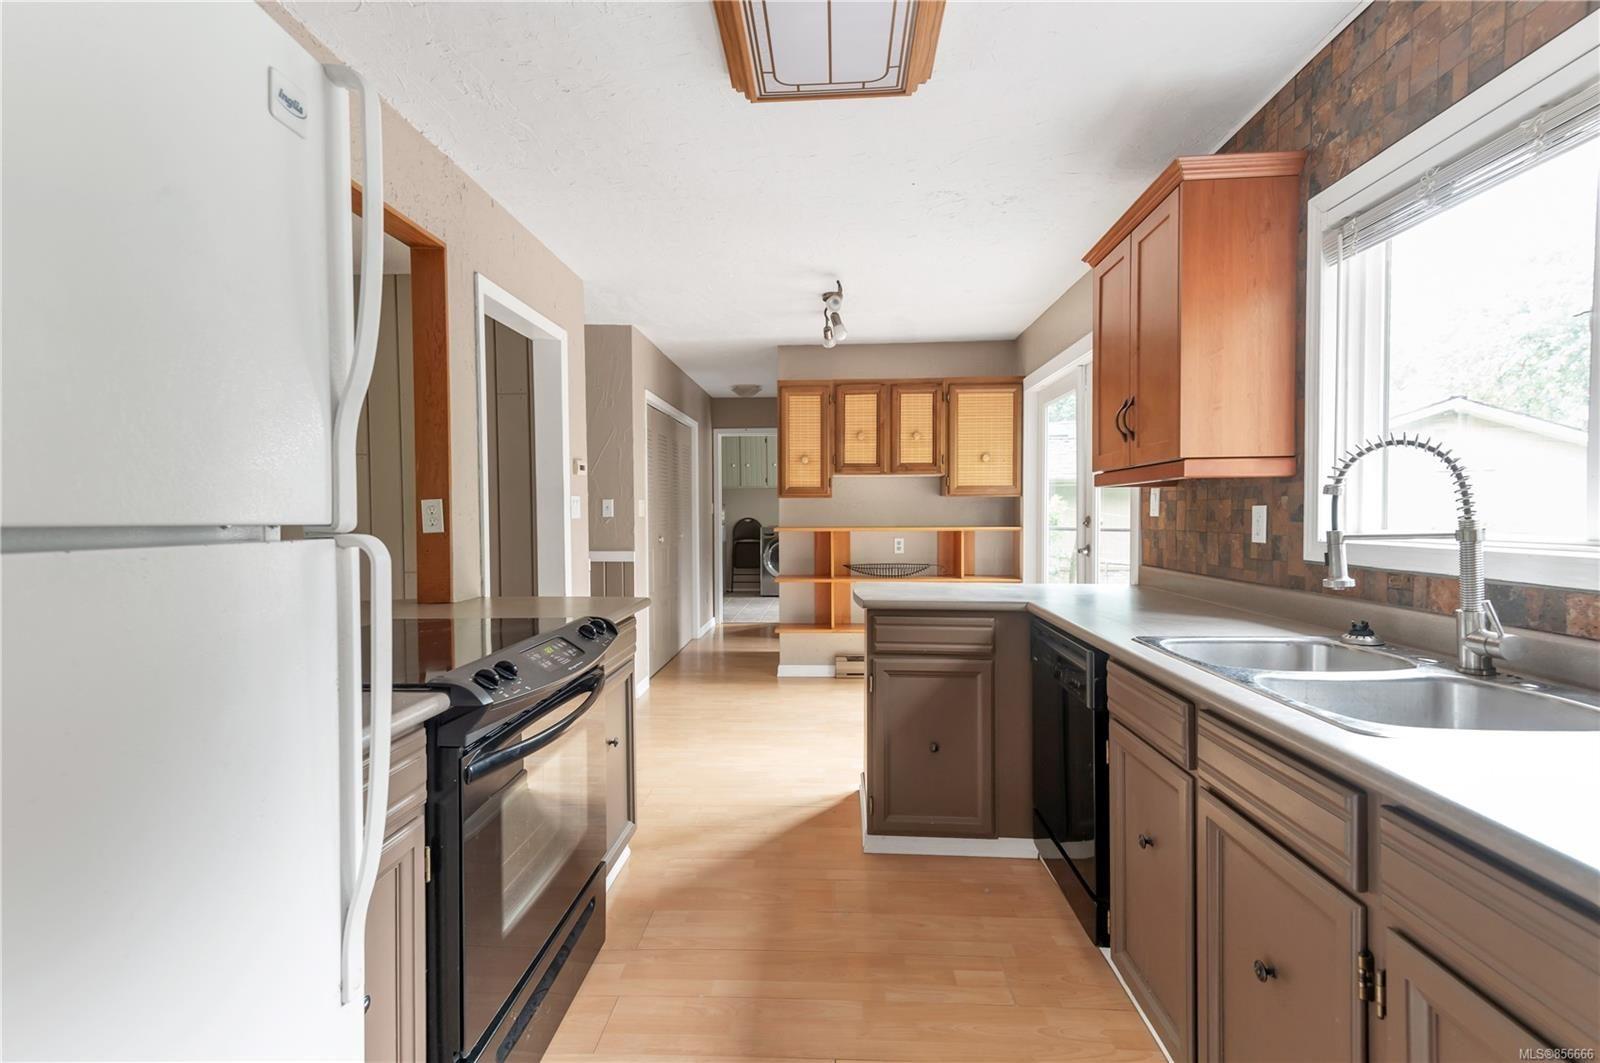 Photo 2: Photos: 2468 Oakes Rd in : CV Merville Black Creek House for sale (Comox Valley)  : MLS®# 856666